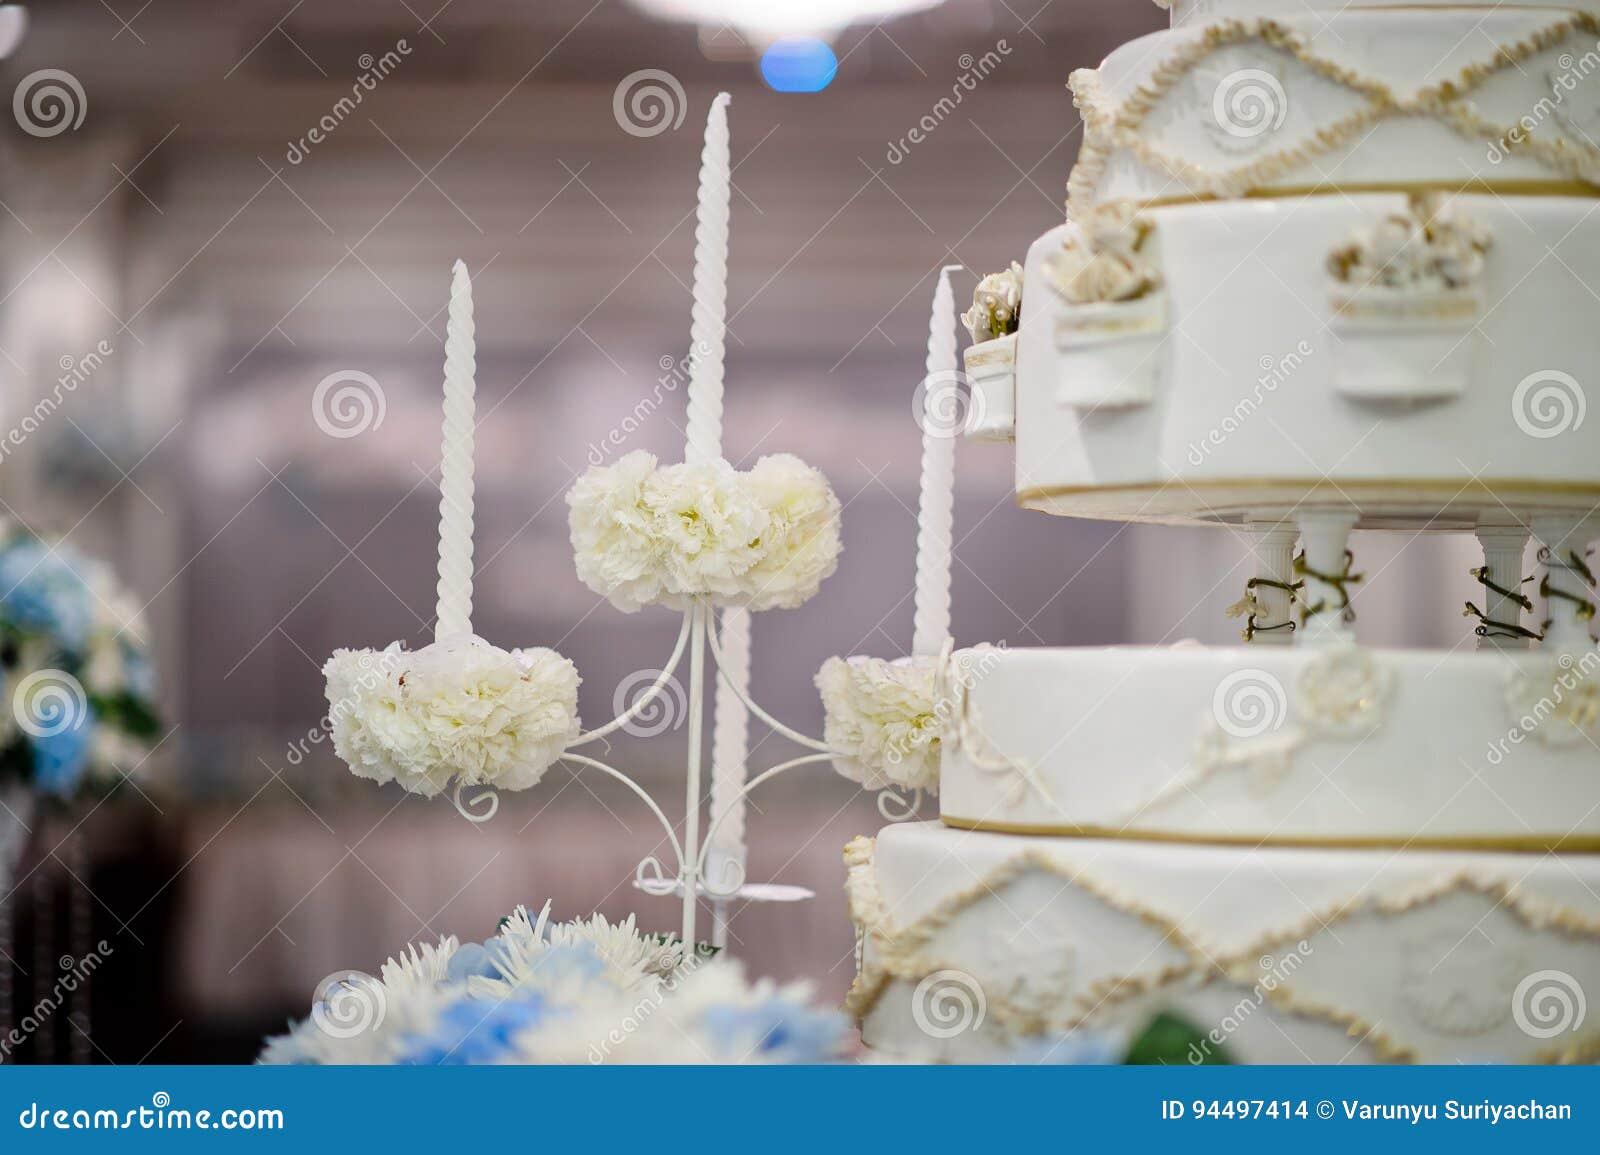 Wedding Cake Stock Photo Image Of Flower Bouquet Event 94497414